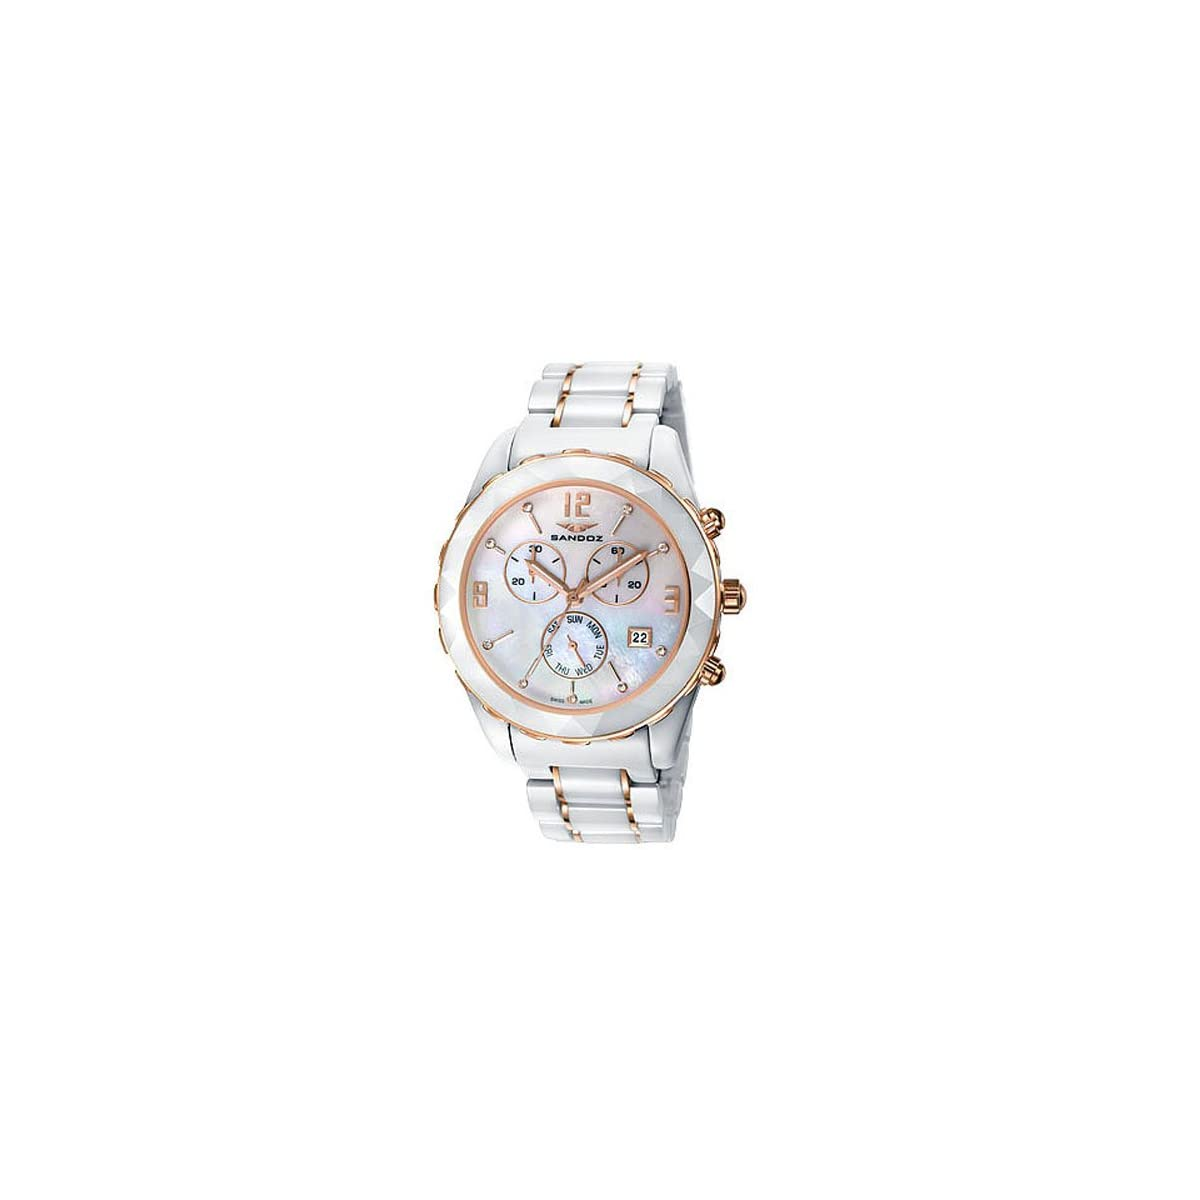 517CgUSHnWL. SS1200  - Reloj Sandoz Le Chic 81274-99 Mujer Nácar